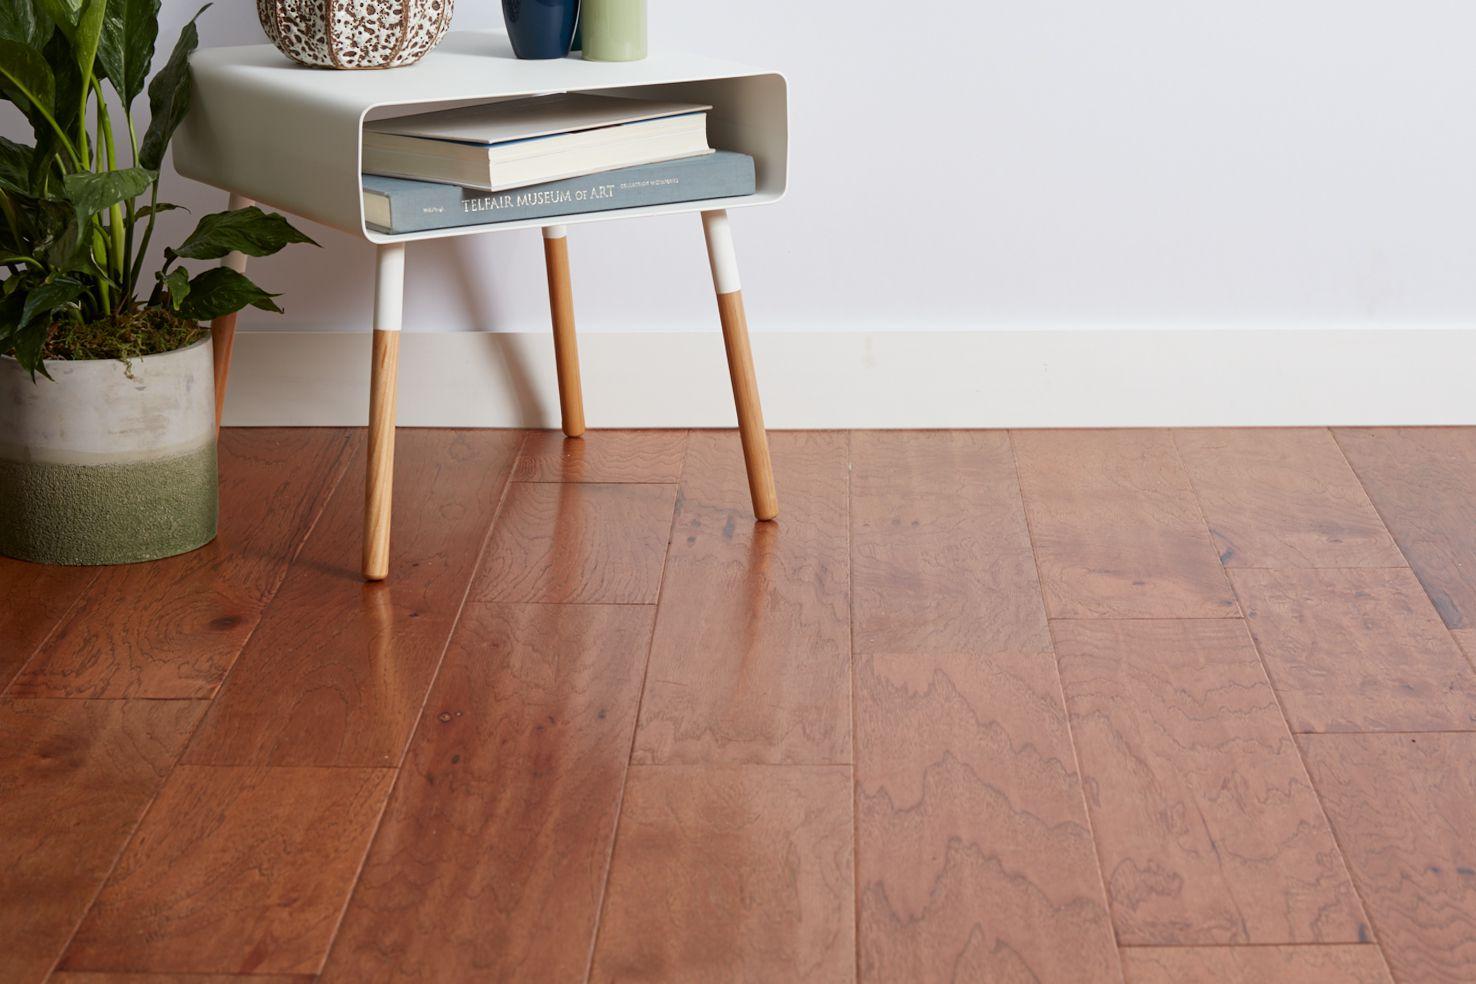 Engineered wood floor with side table